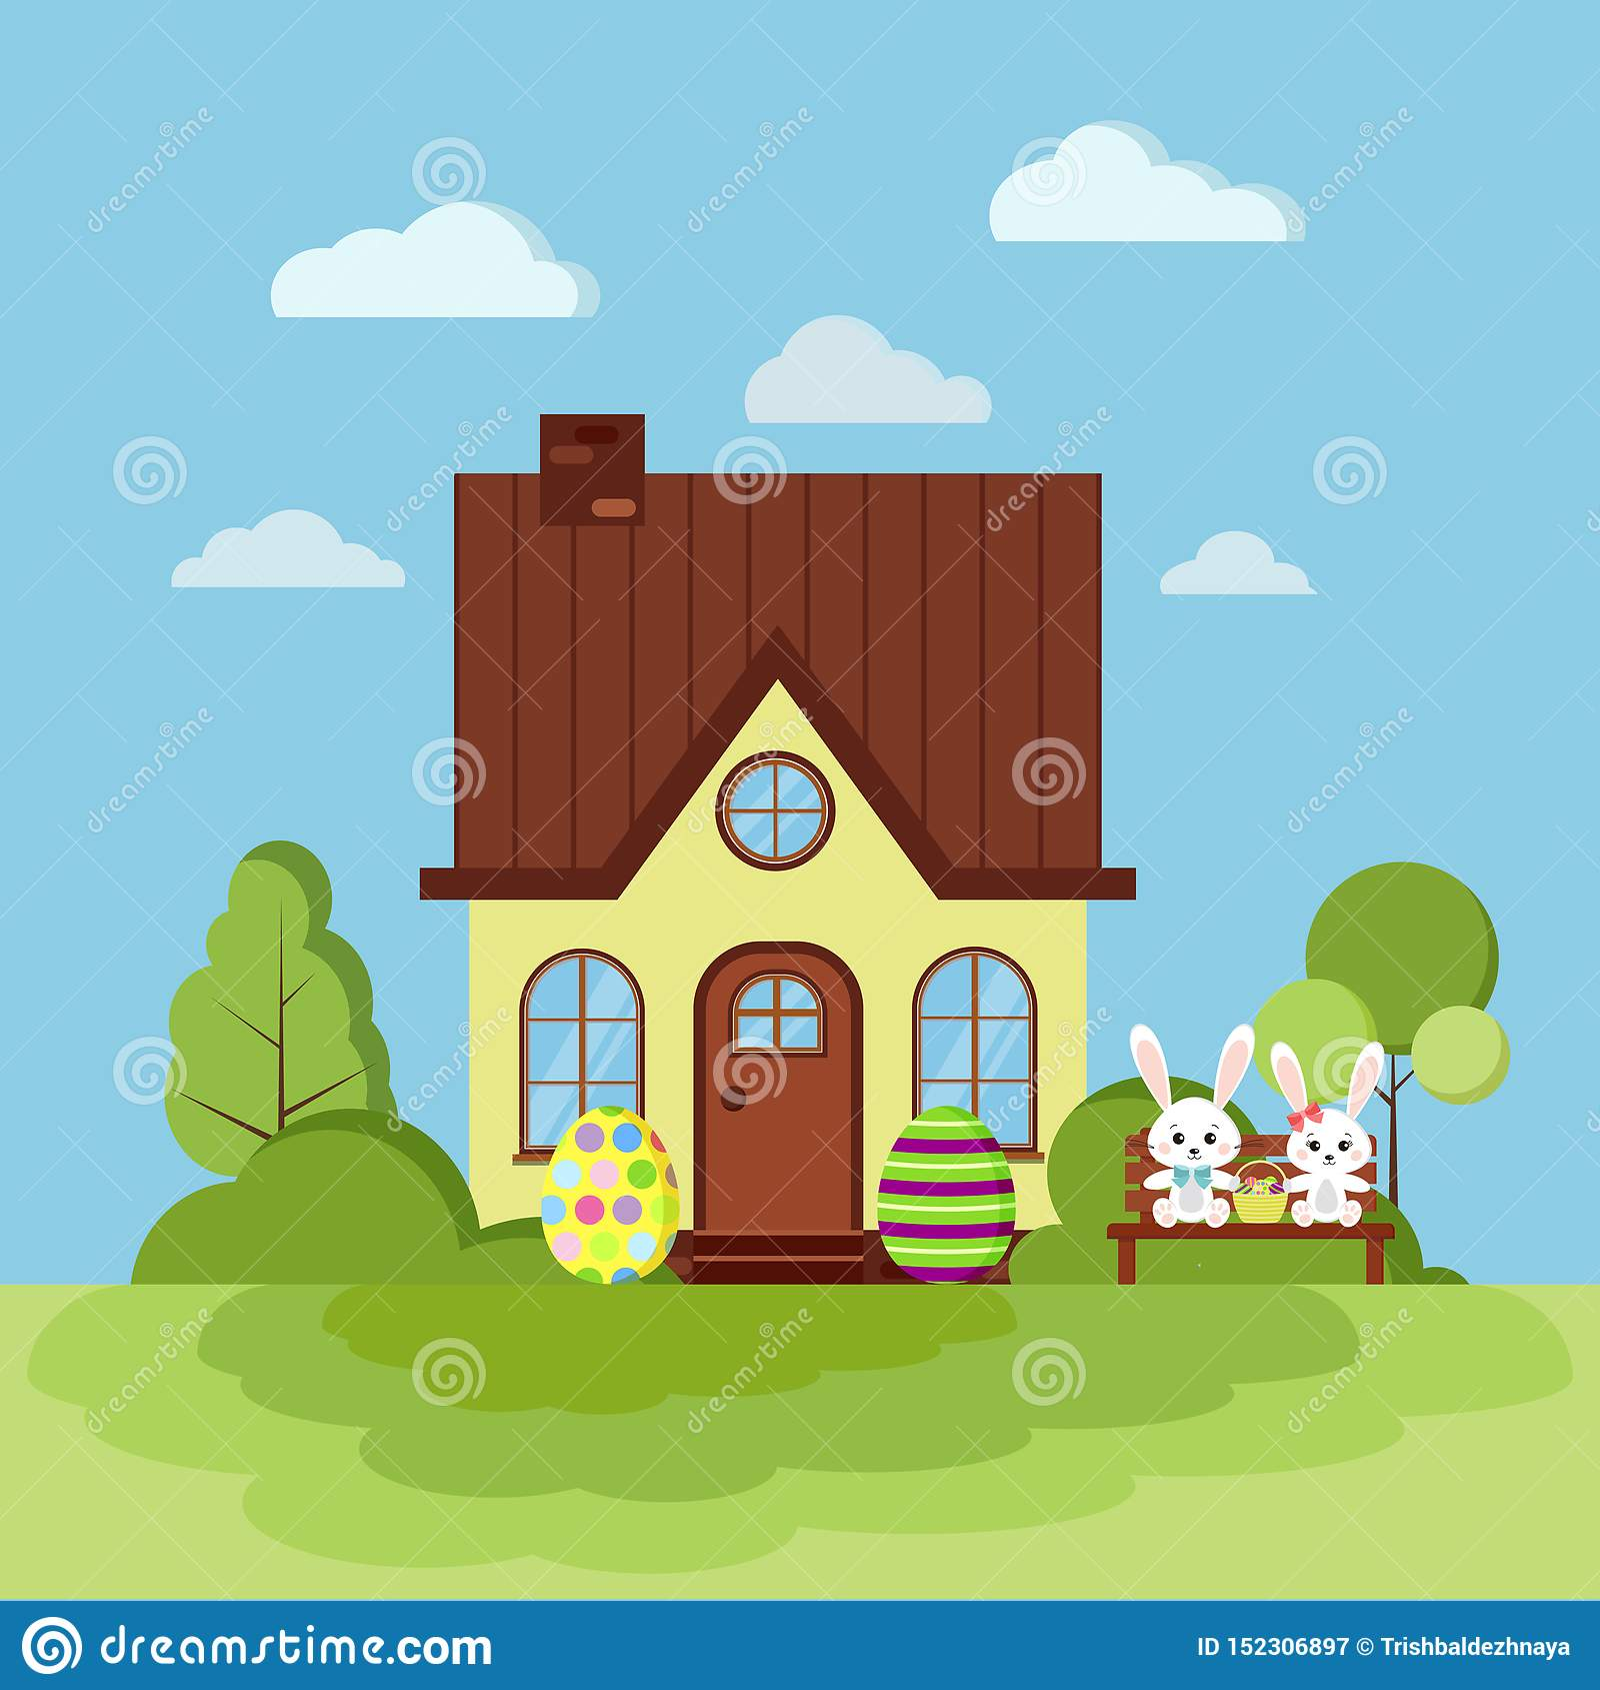 Escena de la naturaleza del paisaje de pascua del verano o de la primavera con la casa rural con la chimenea